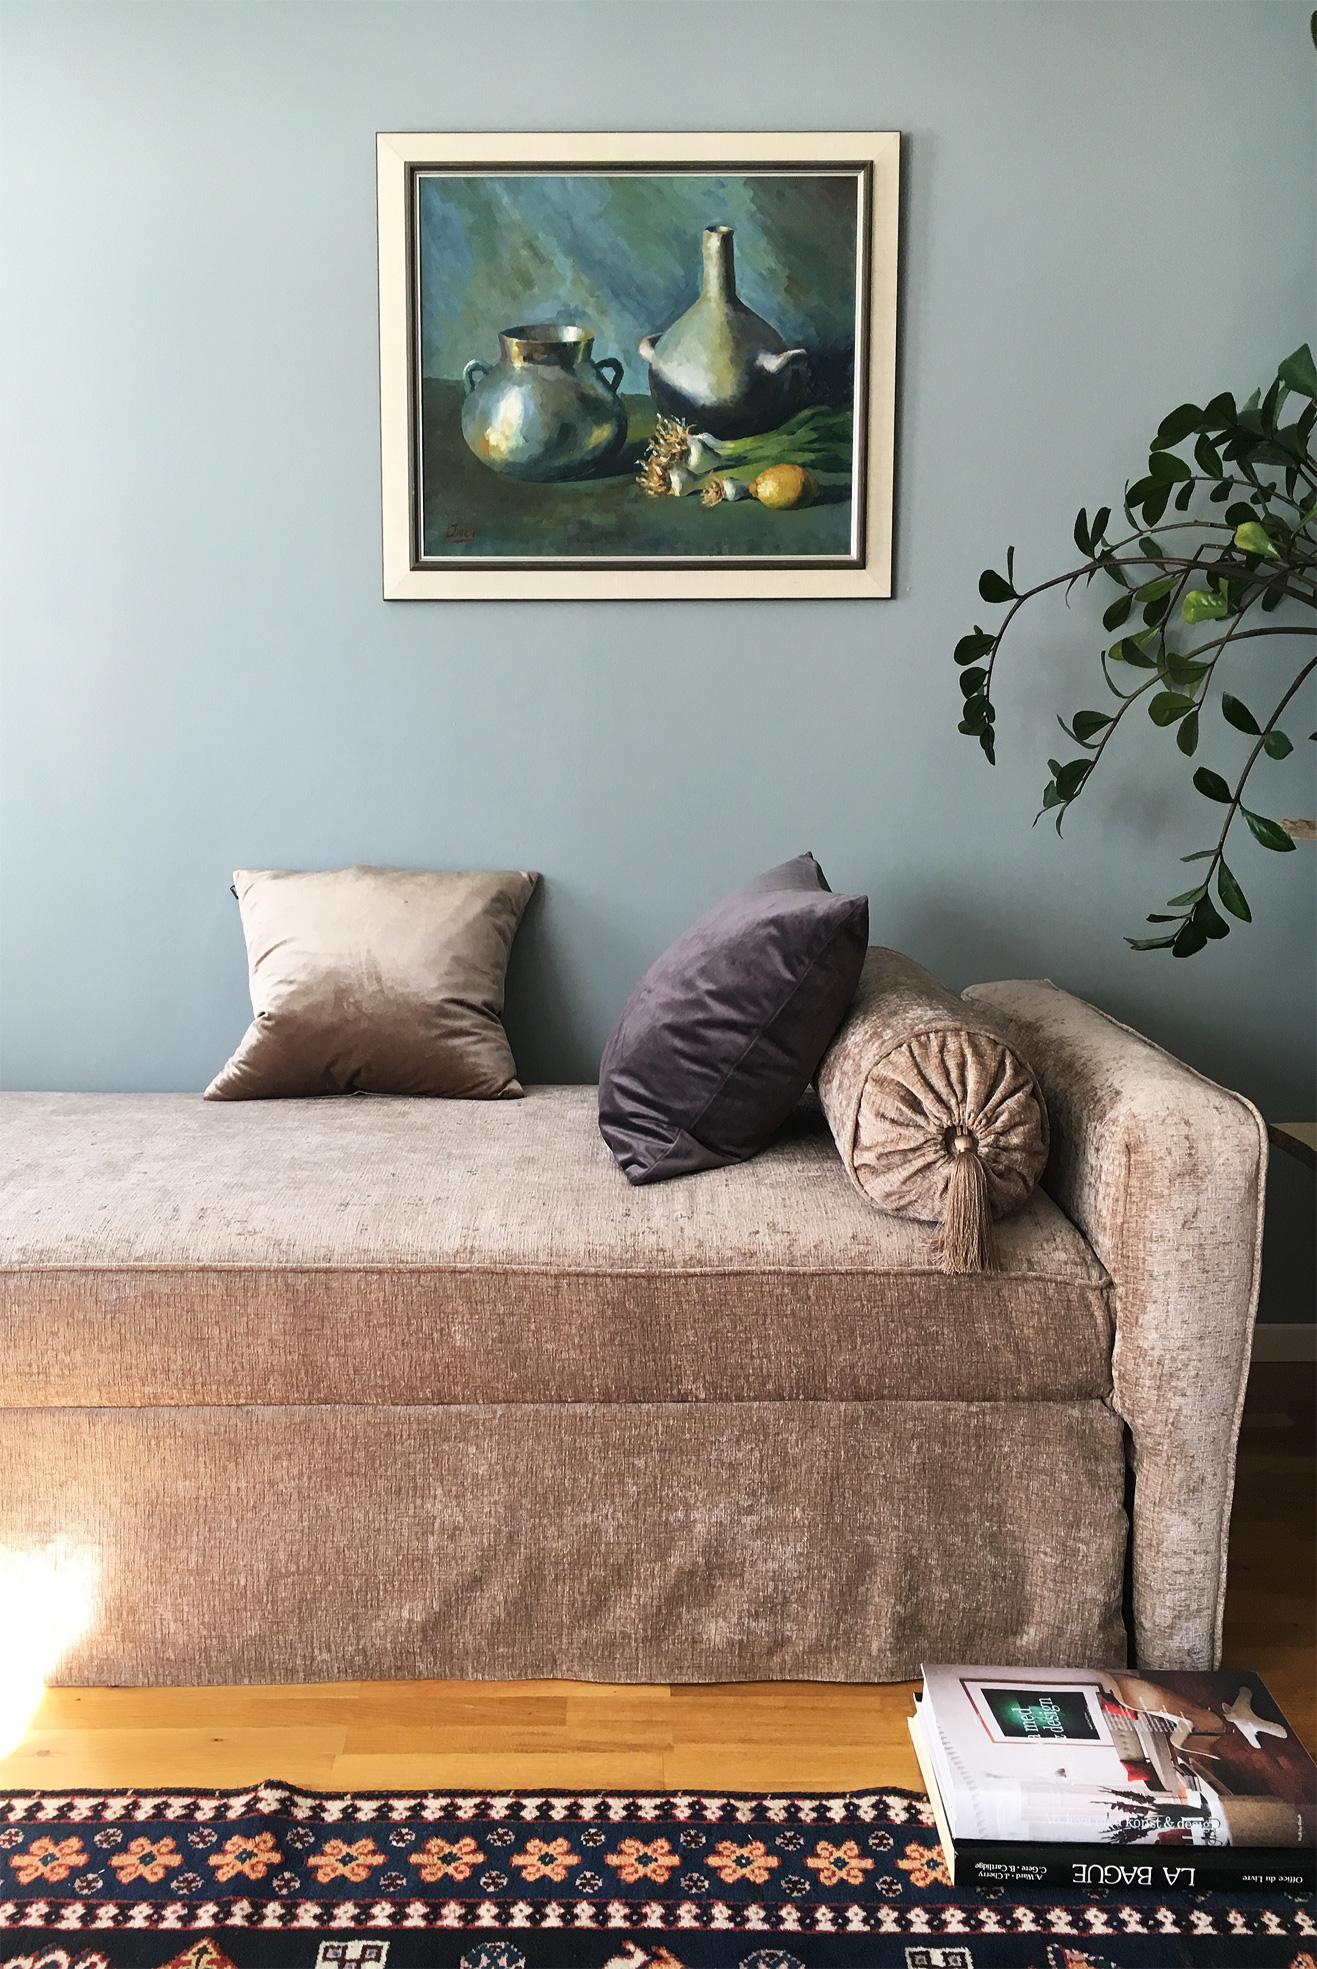 Velvet, sammet, cushions kuddar, sofa, soffa, daybed, dagbädd, recycled sofa